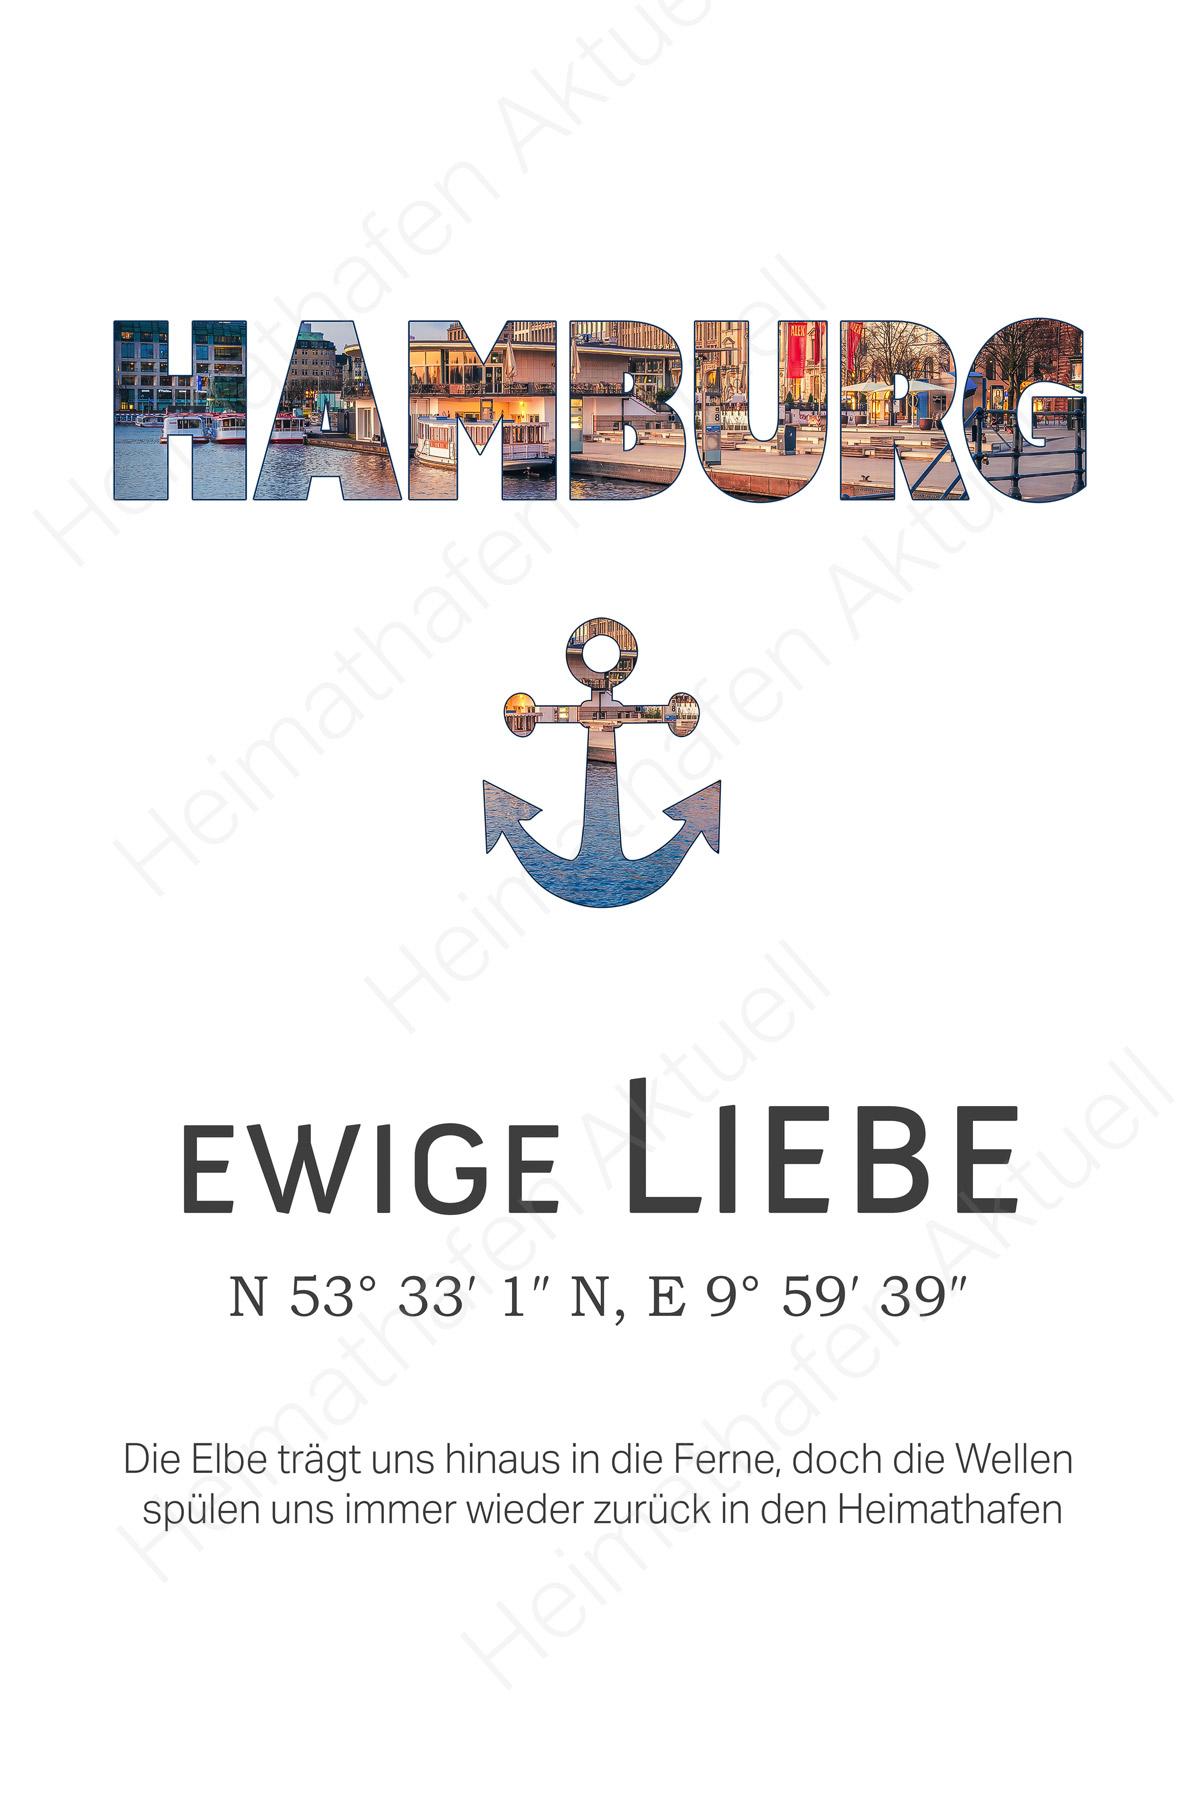 Hamburg - Ewige Liebe